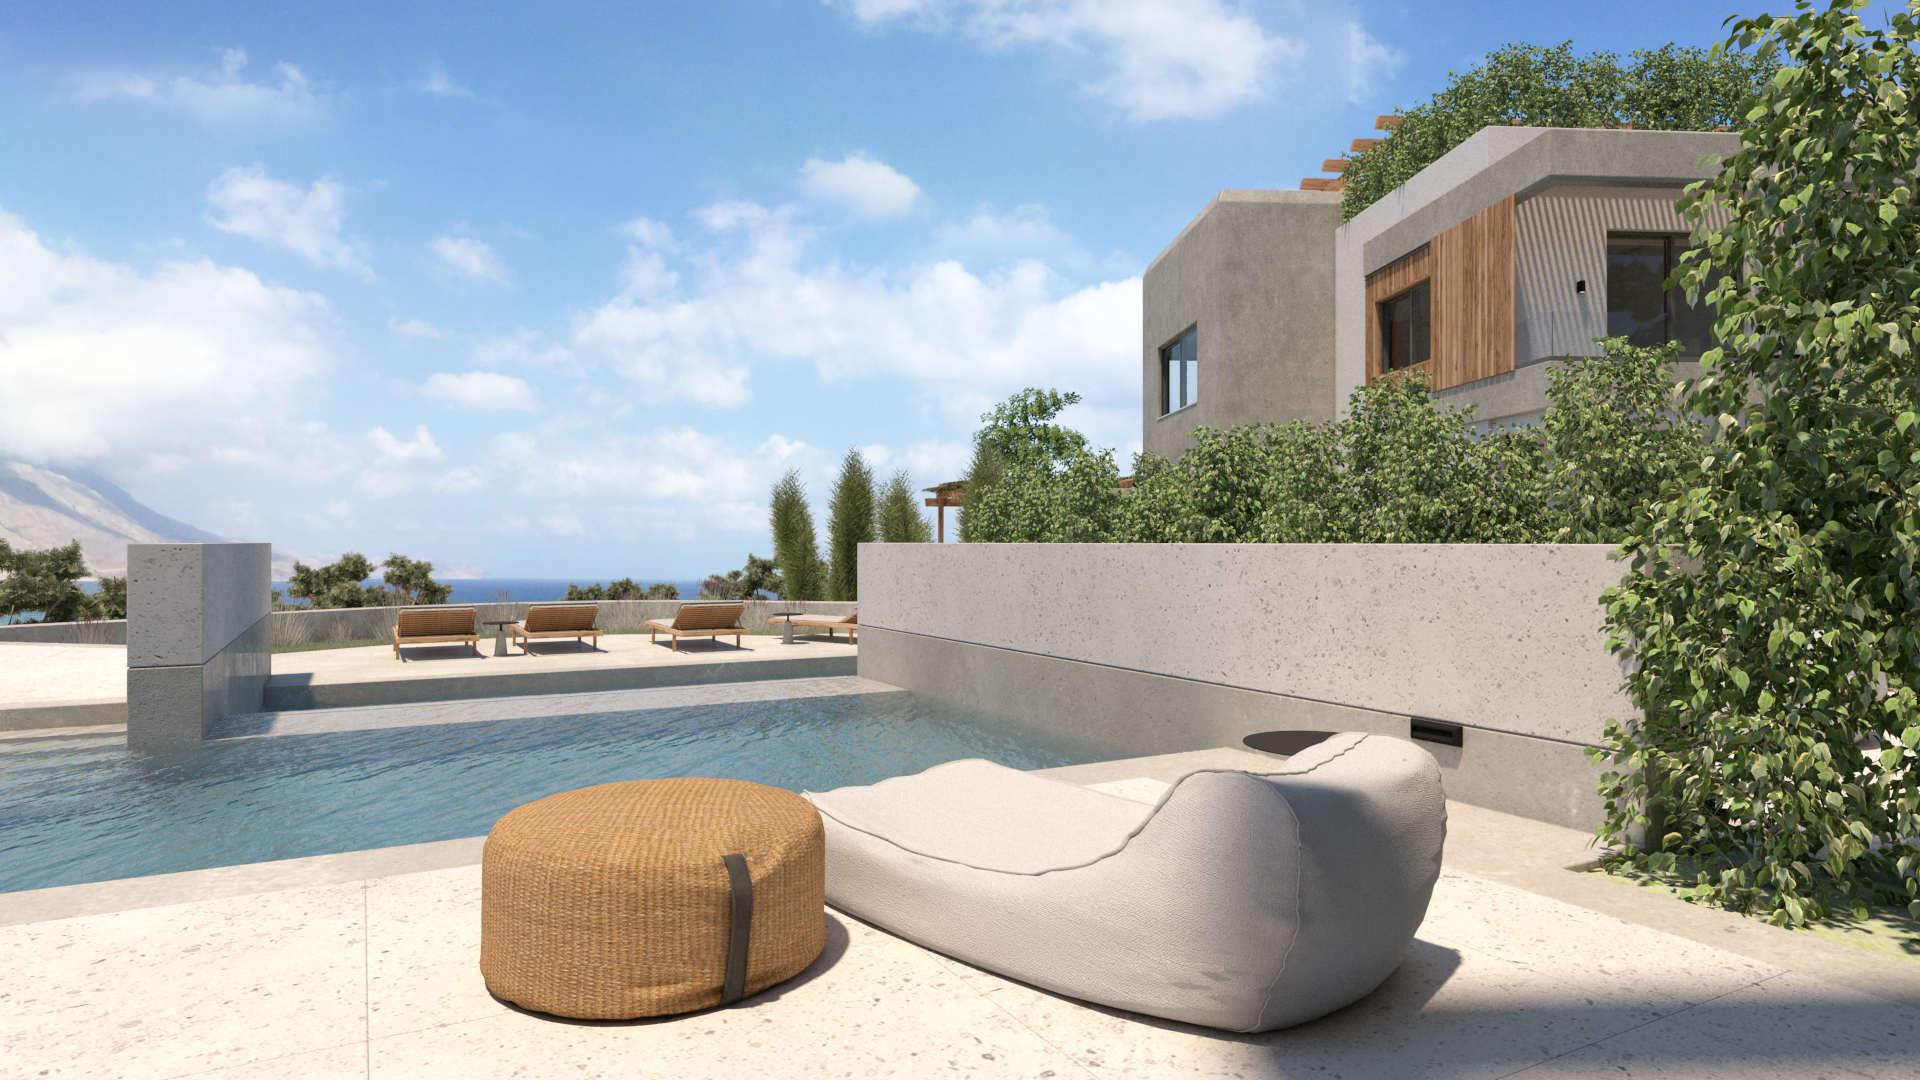 holiday homes renovation, outdoor spaces with pools, ανακαίνιση παραθεριστικικών κατοικιών, εξωτερικοί χώροι με πισίνες